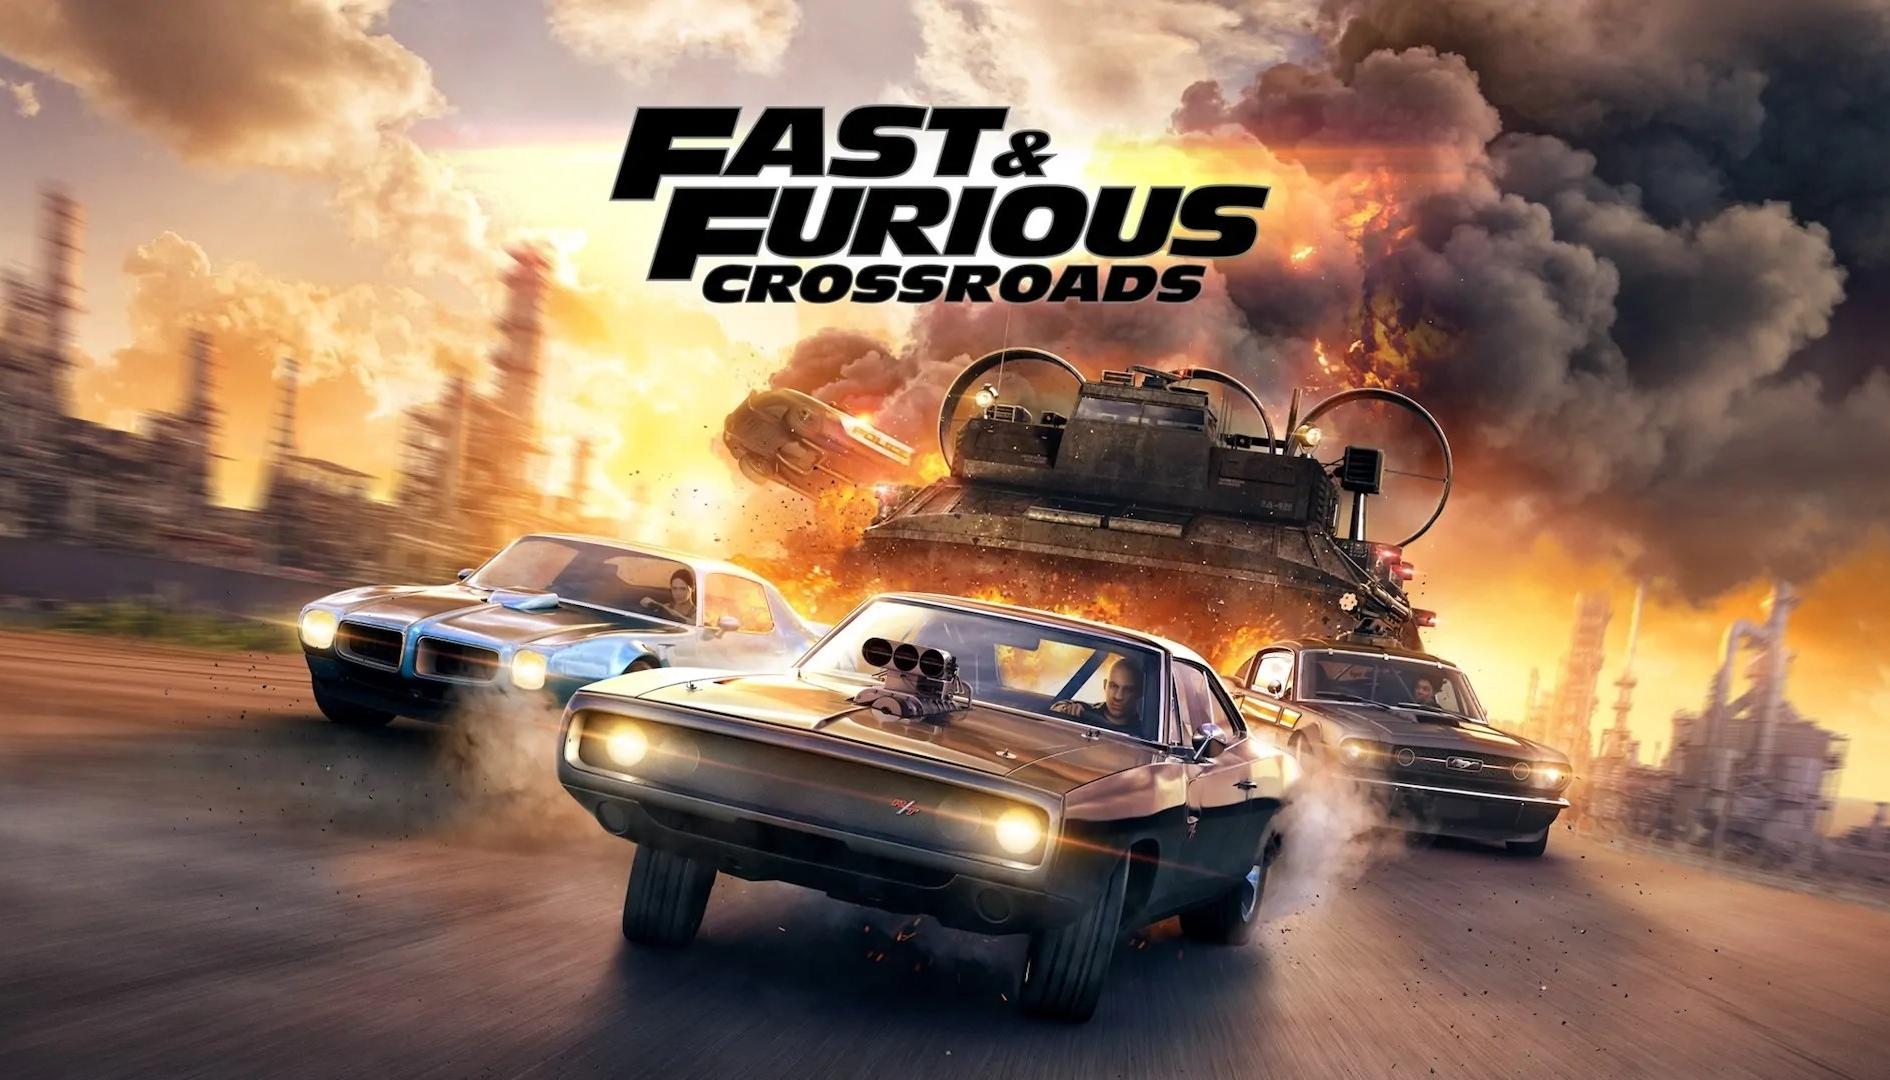 Trailer di lancio per Fast & Furious Crossroads